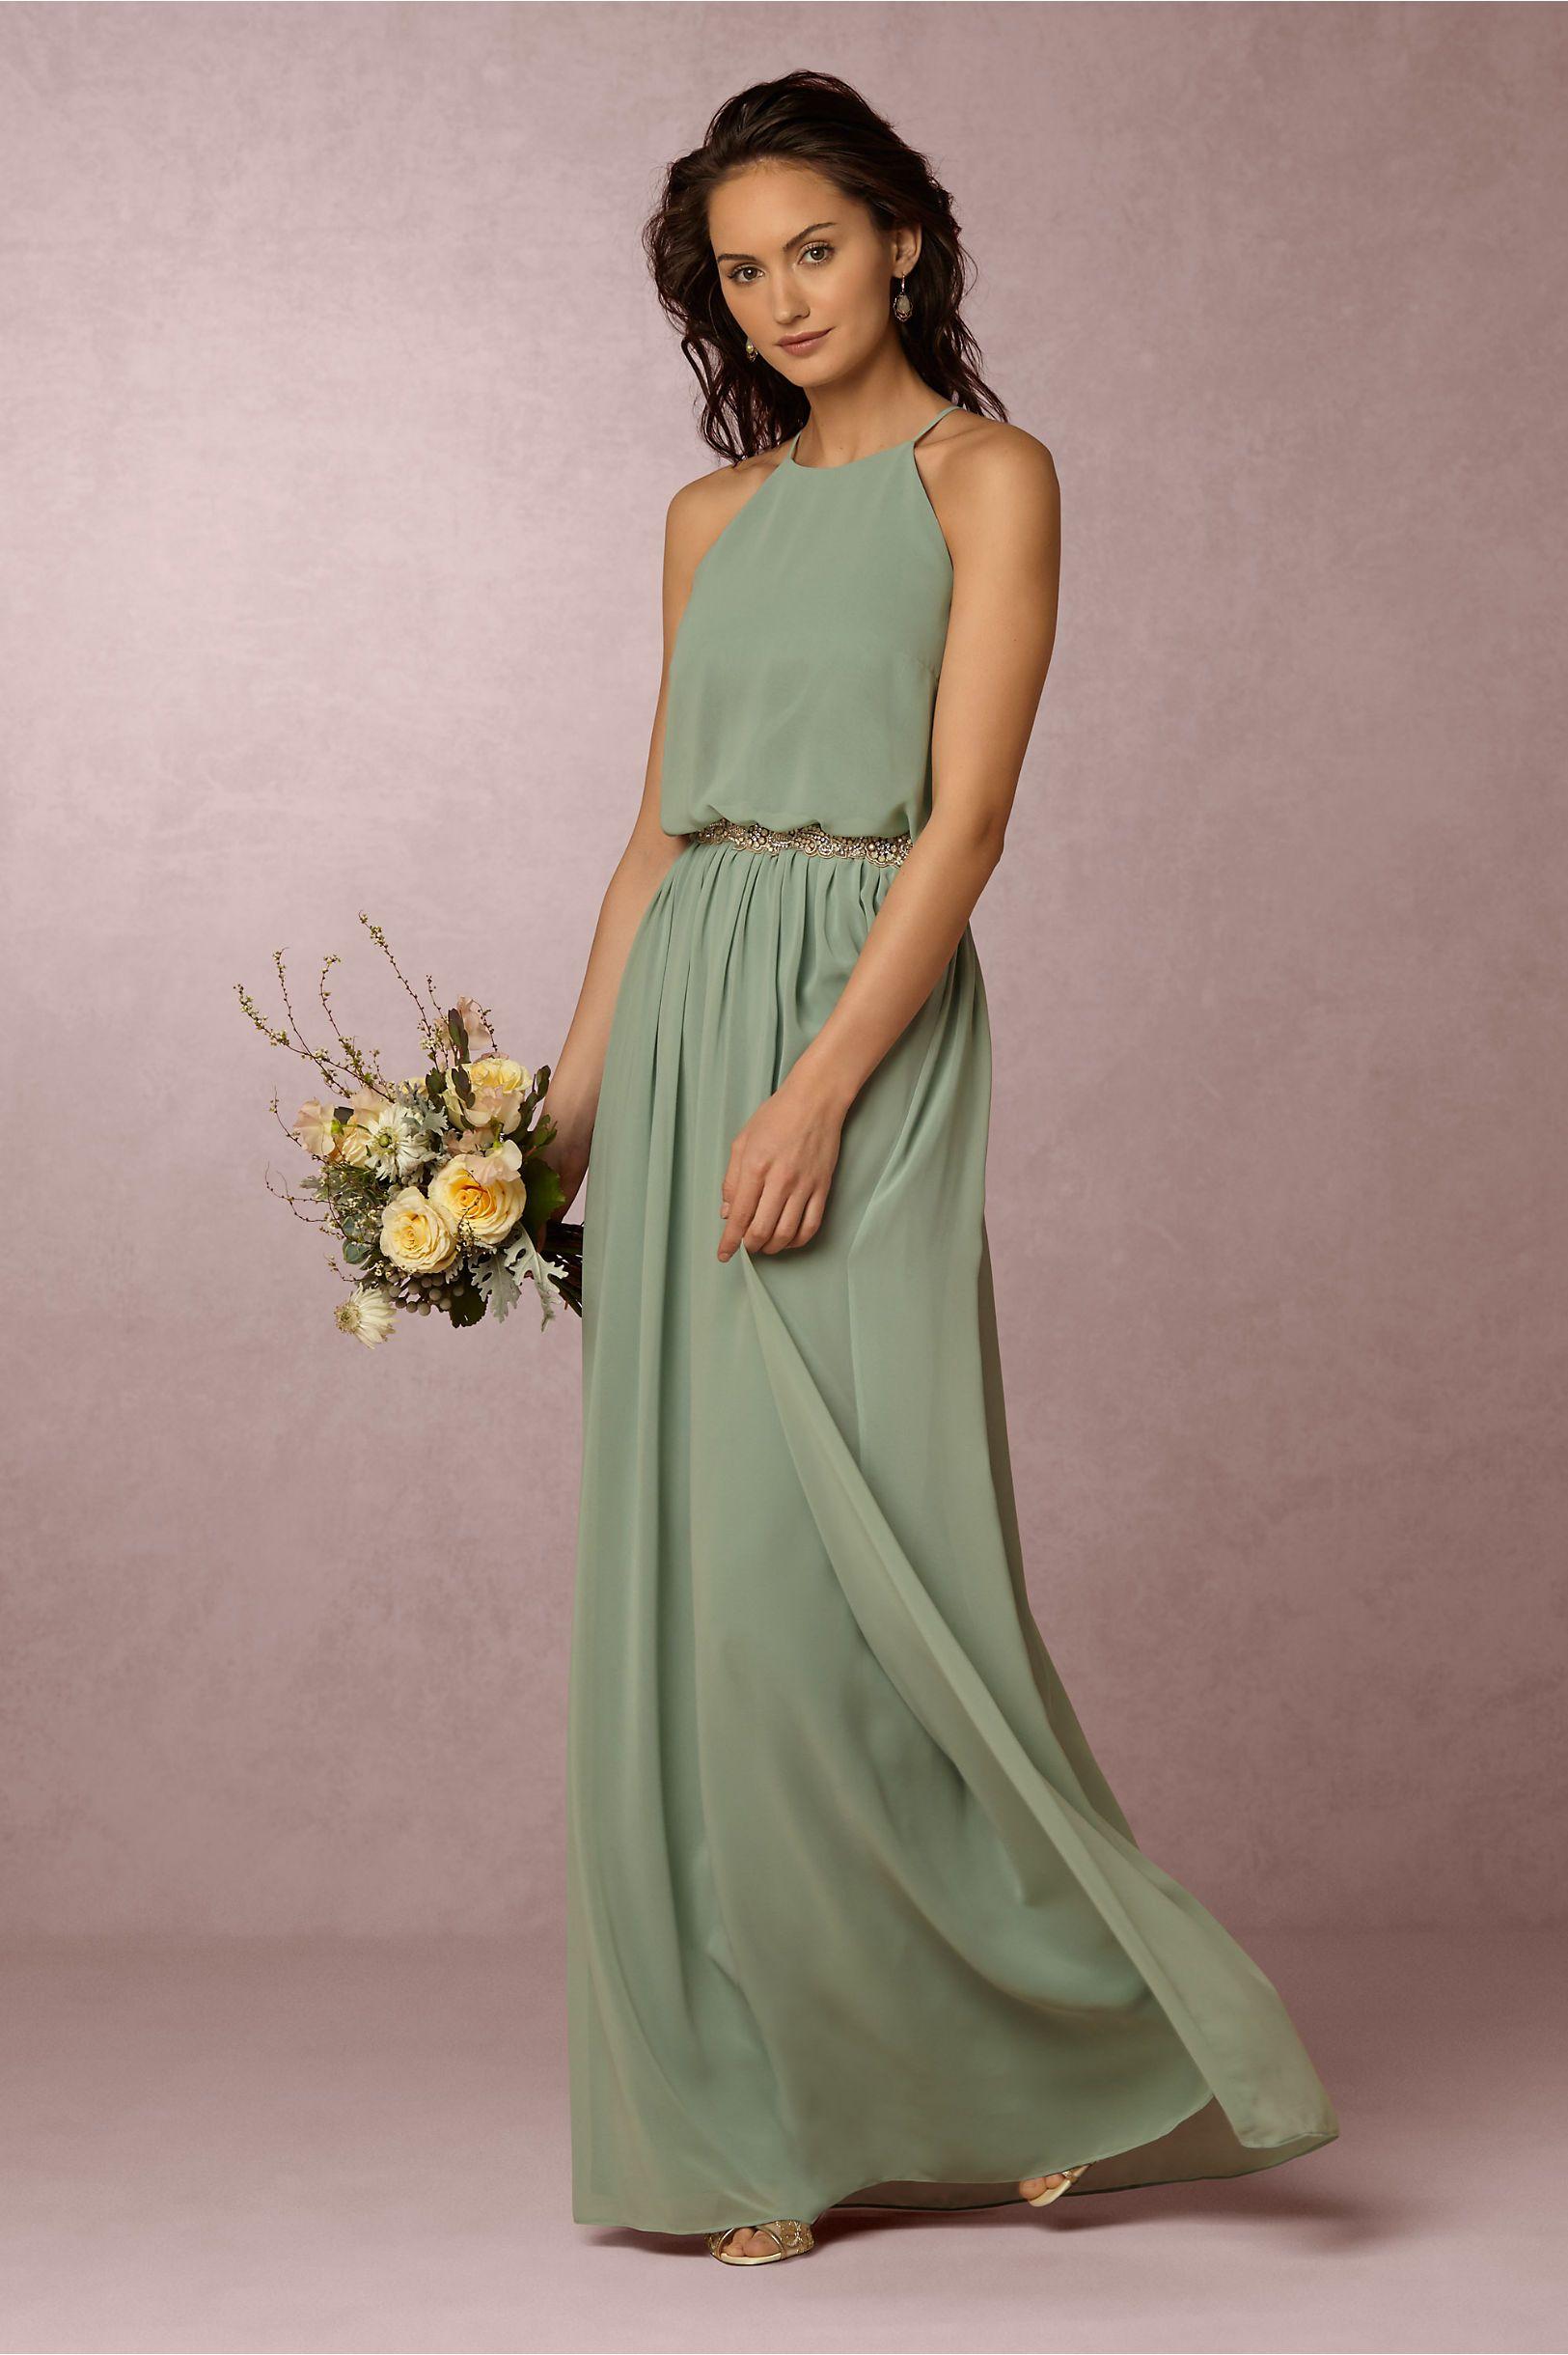 Bhldn alana dress in bridesmaids bridesmaid dresses at bhldn